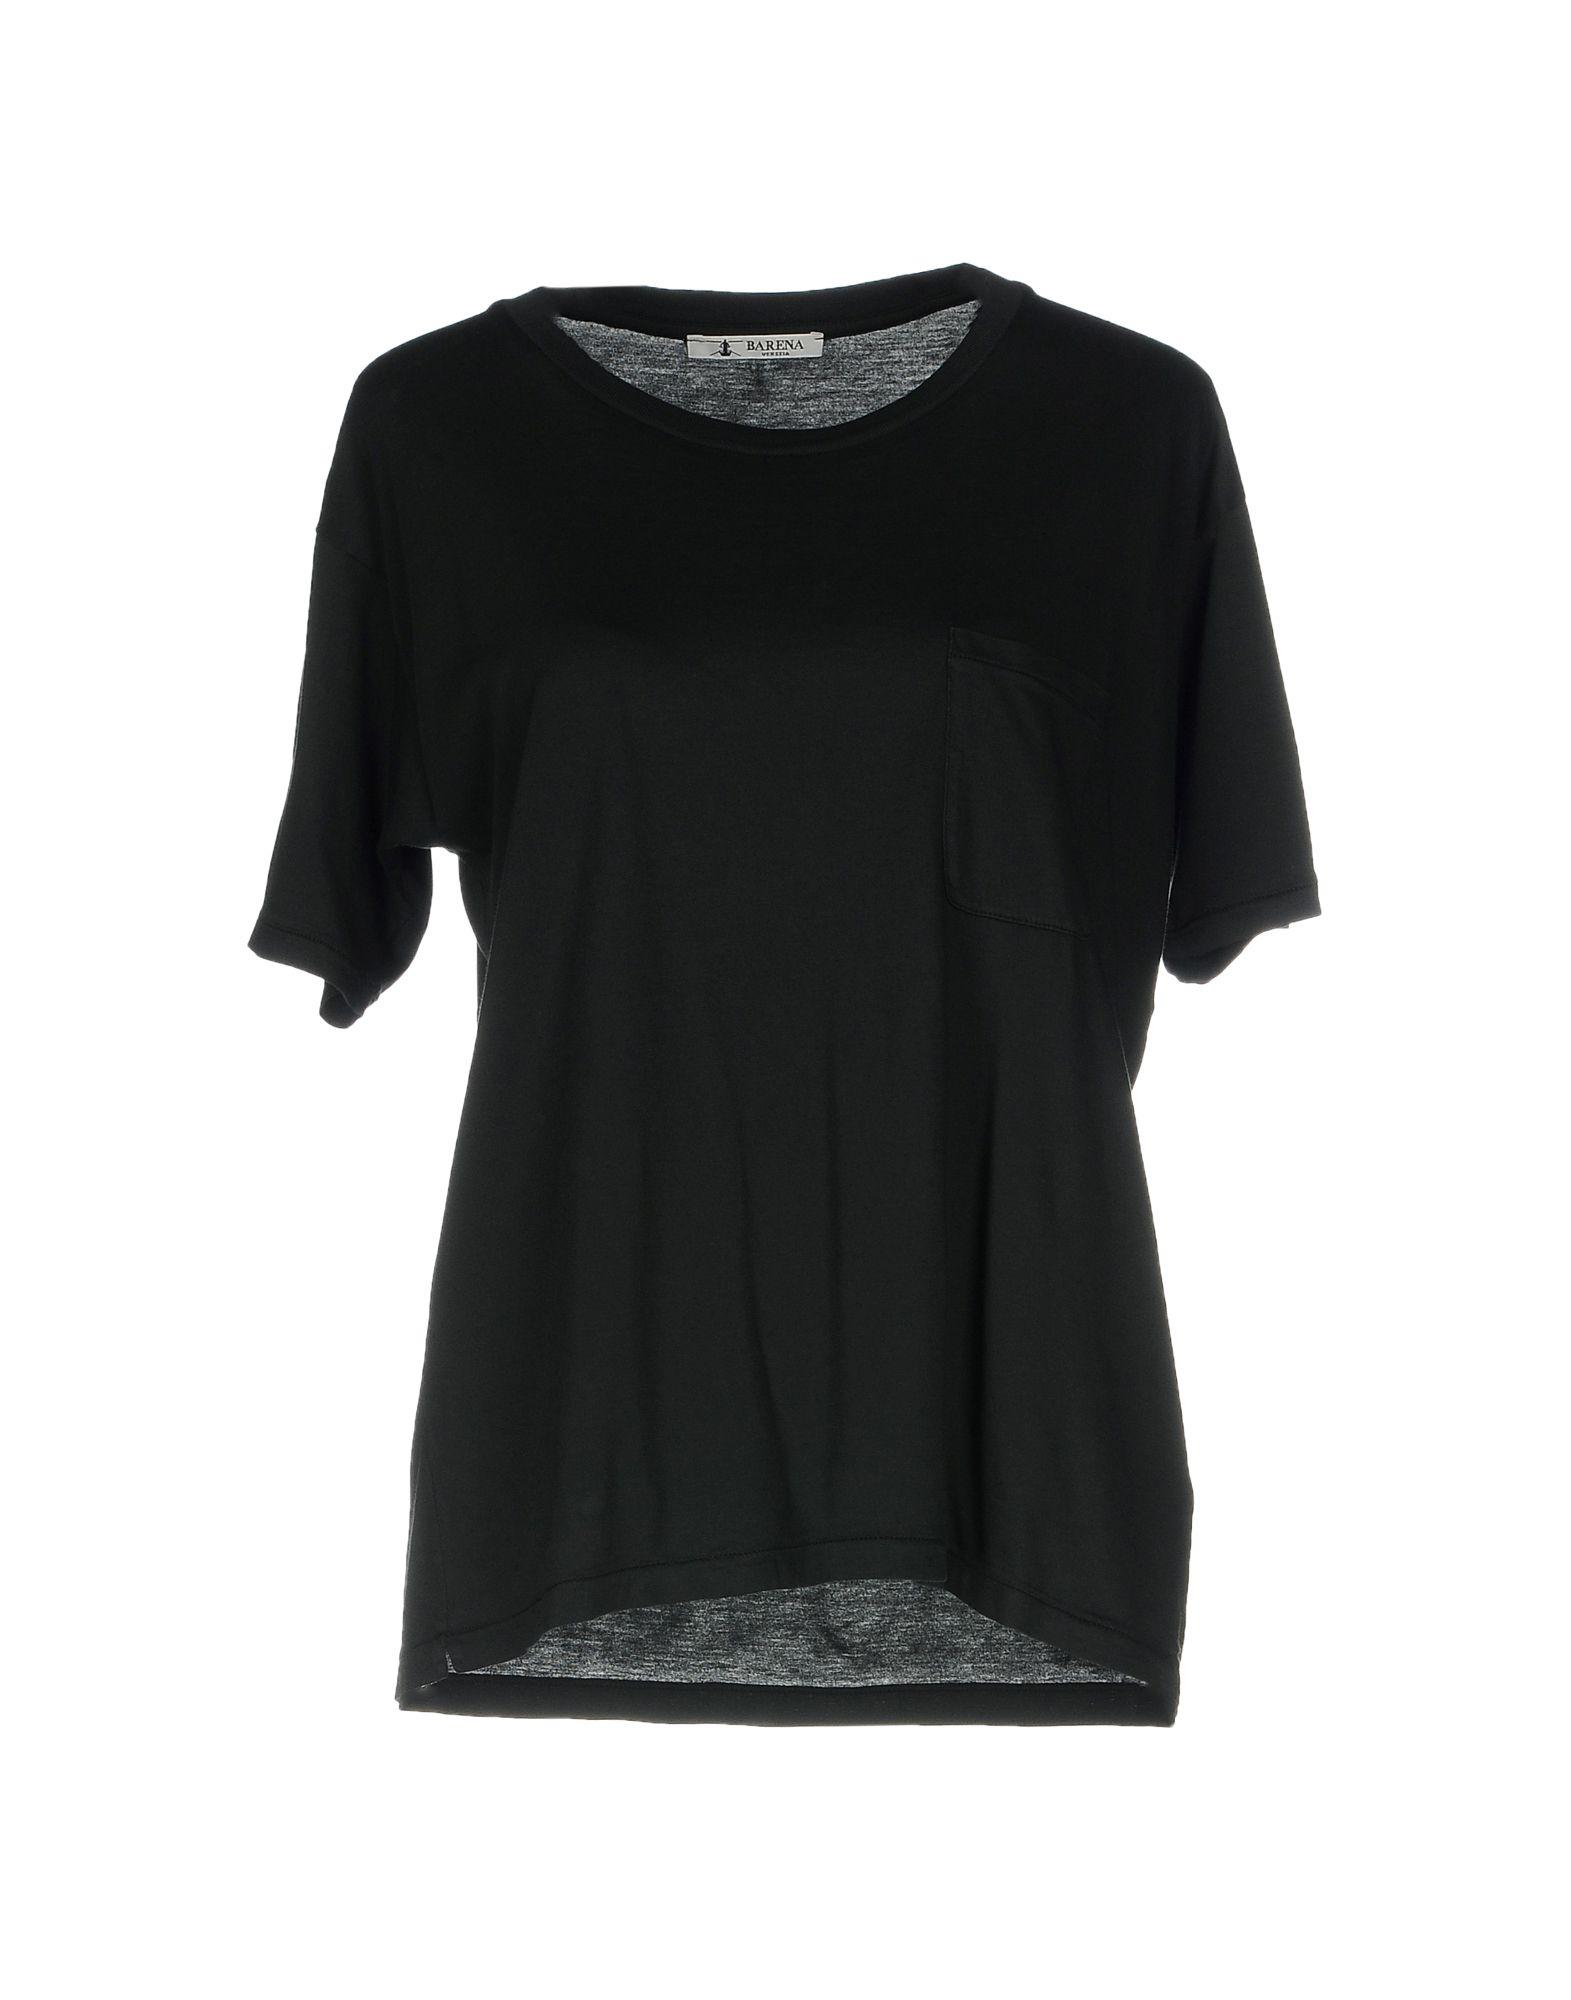 Barena Venezia T-Shirt In Black